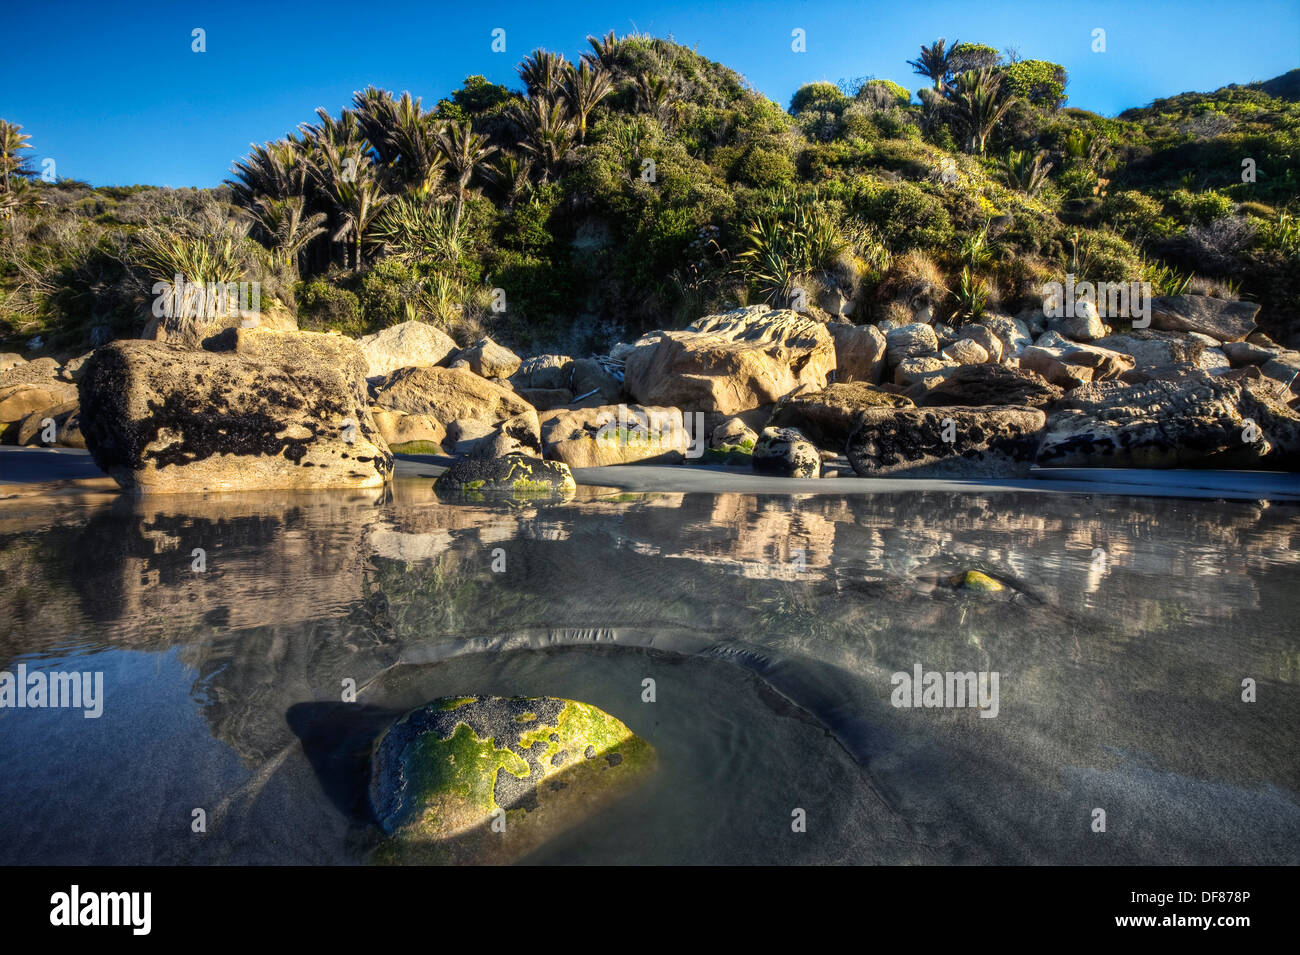 Incoming tide swirls past algae and shell covered rock, nikau palms in coastal bush near Punakaiki, Woodpecker Bay, Paparoa - Stock Image